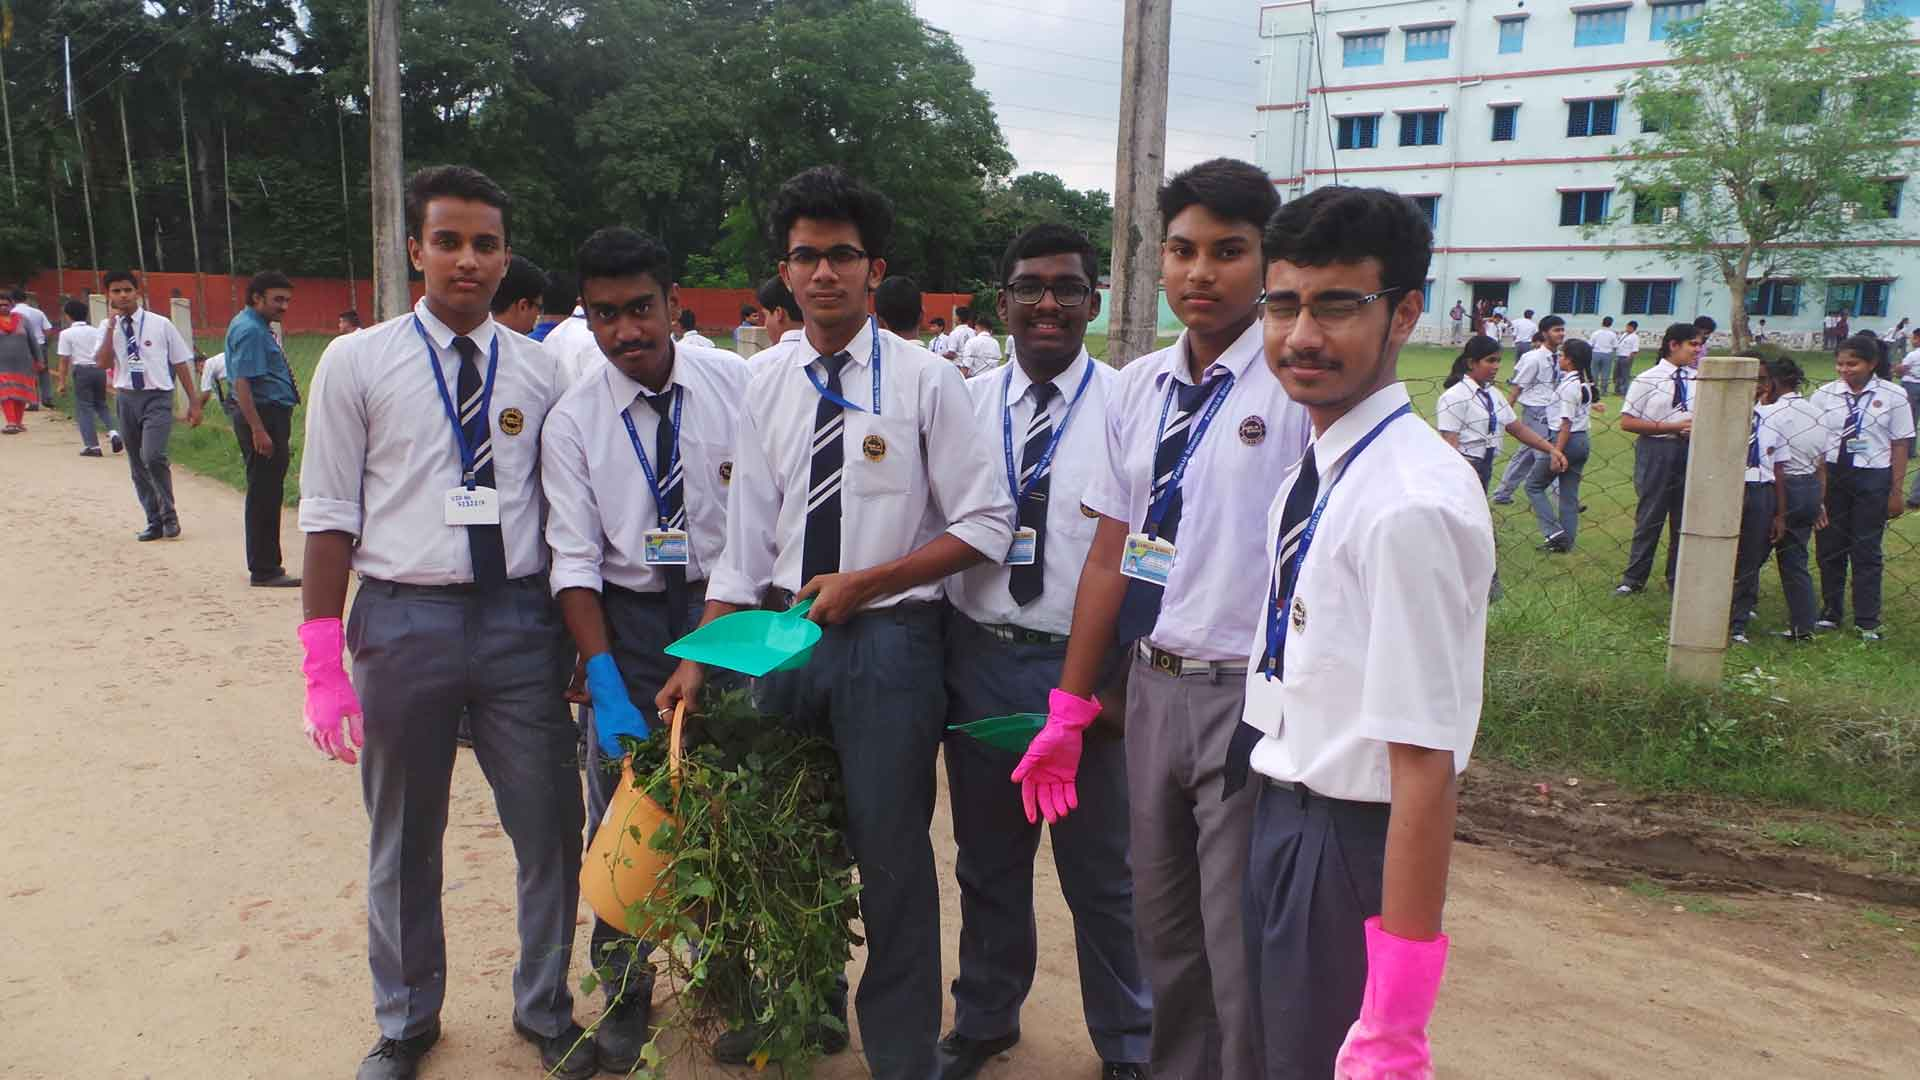 Swach Bharat (Clean India)